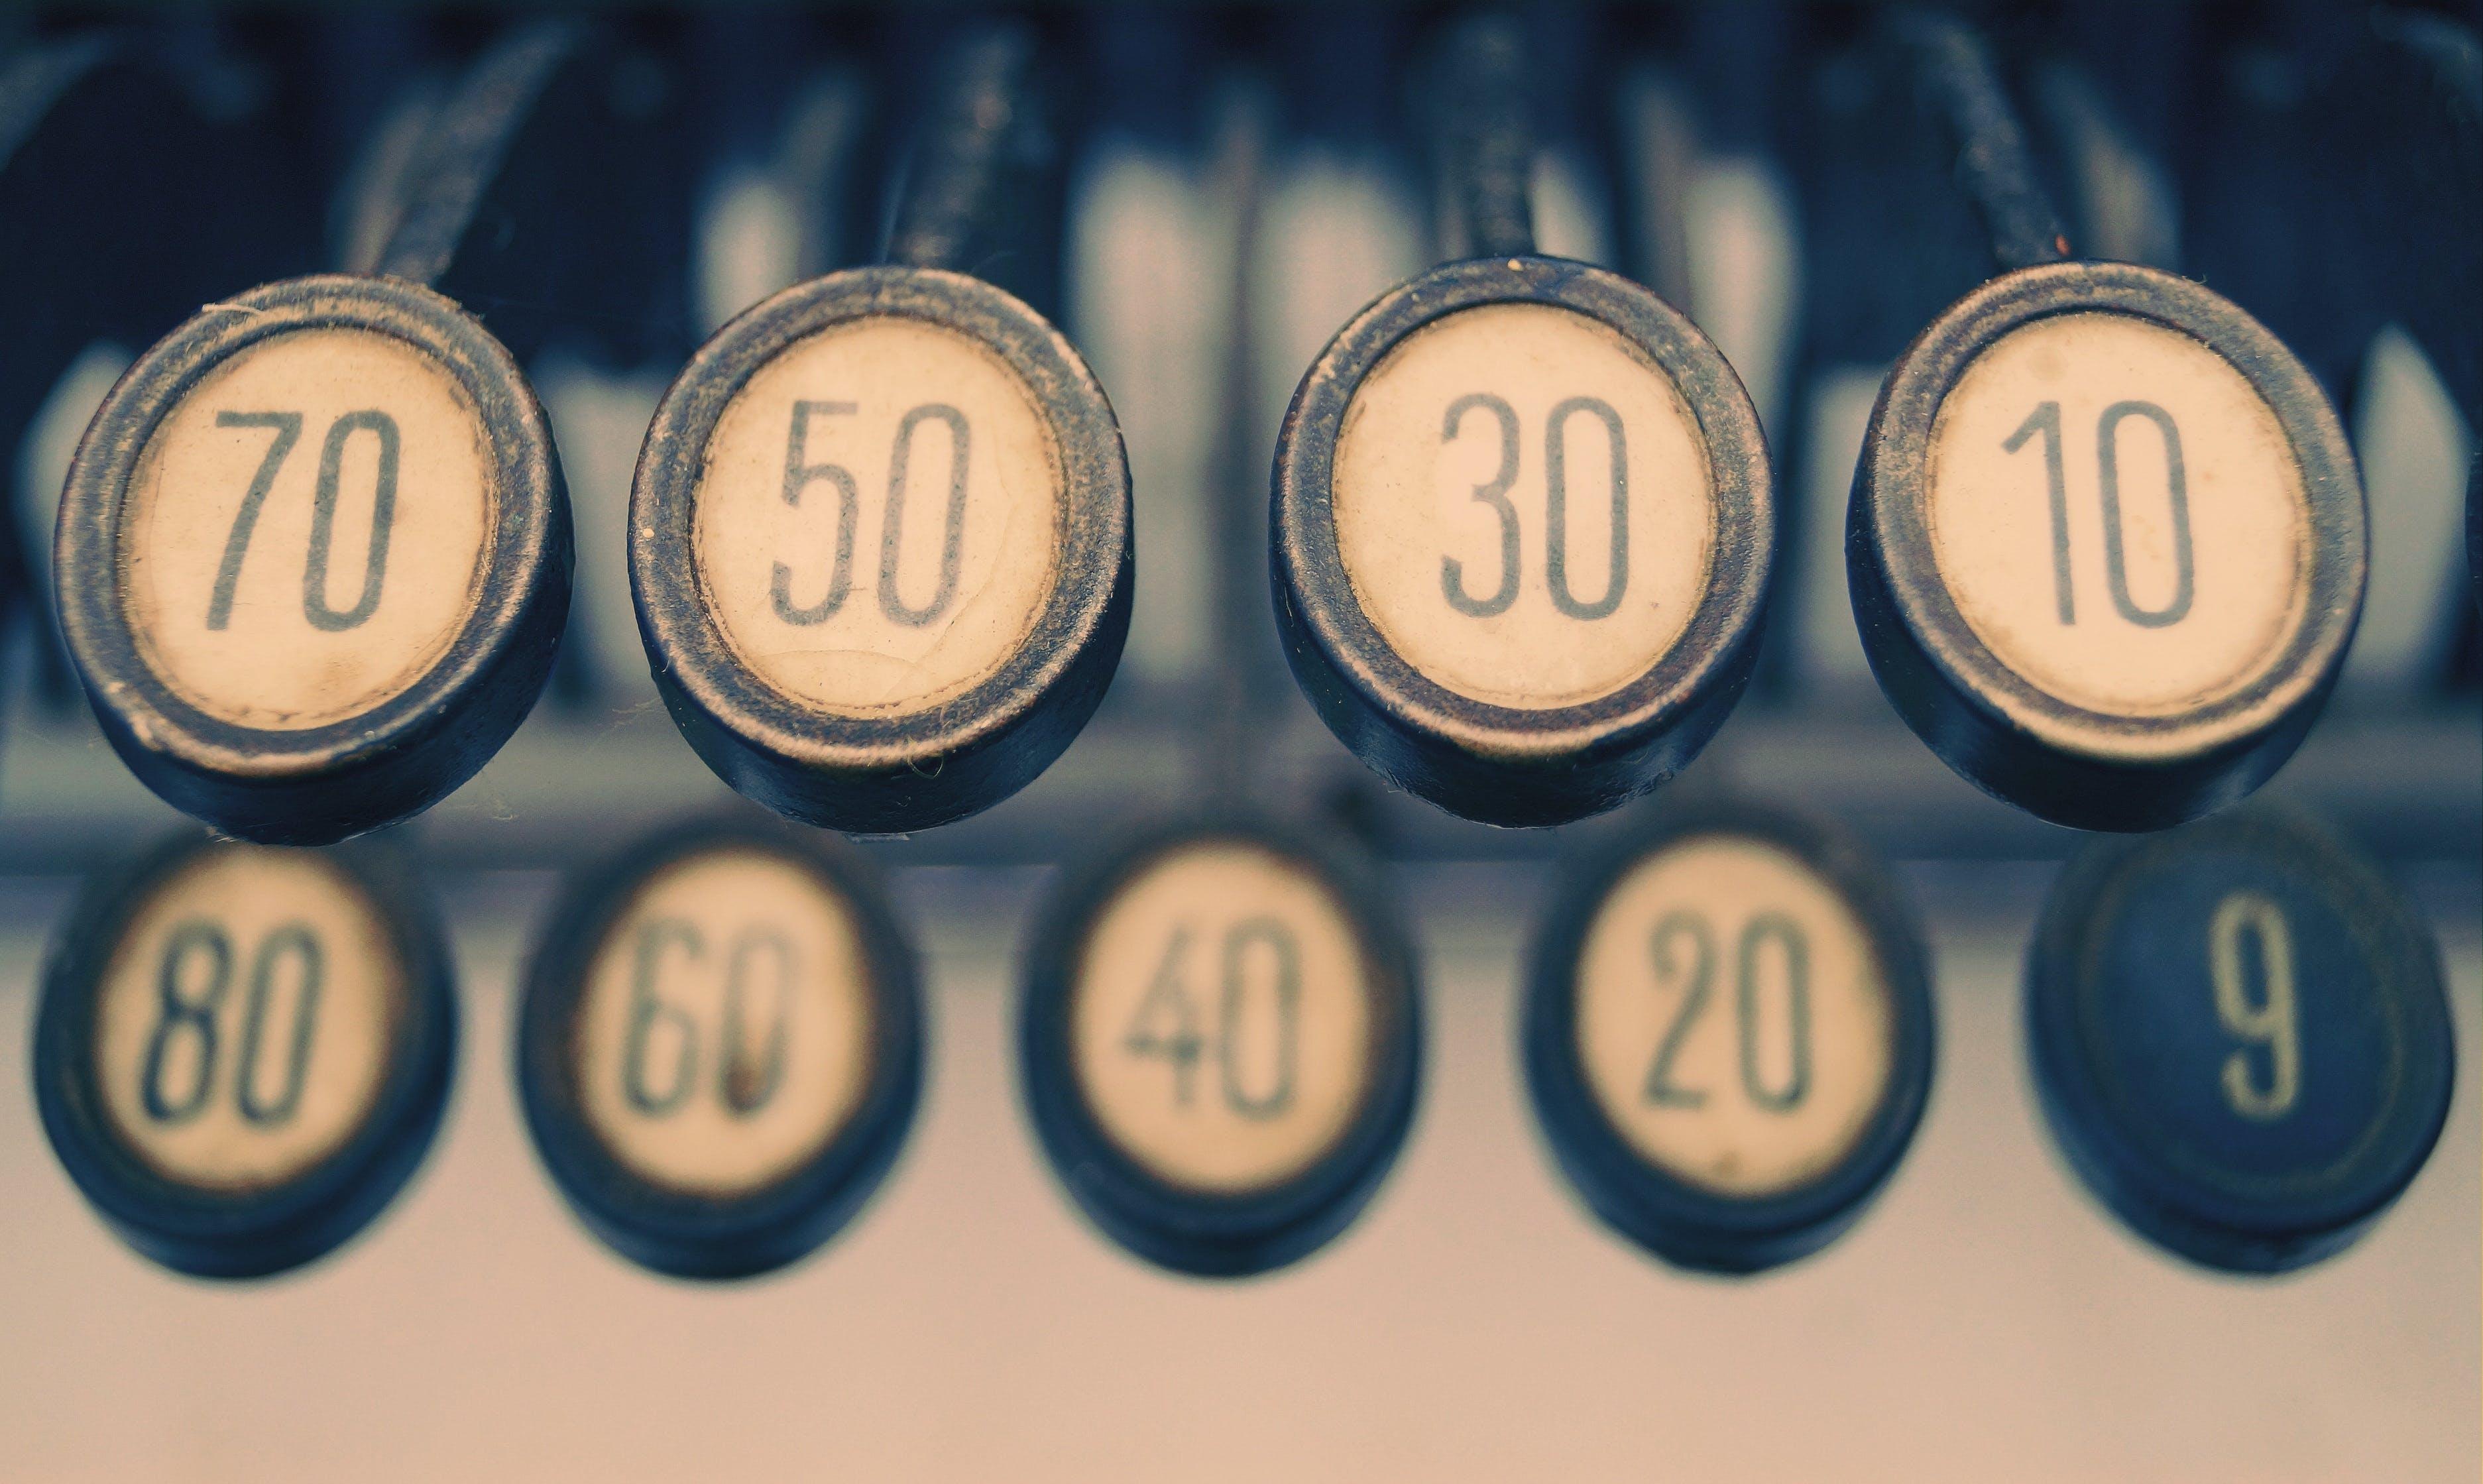 Close-up Photography of Gray Adding Machine